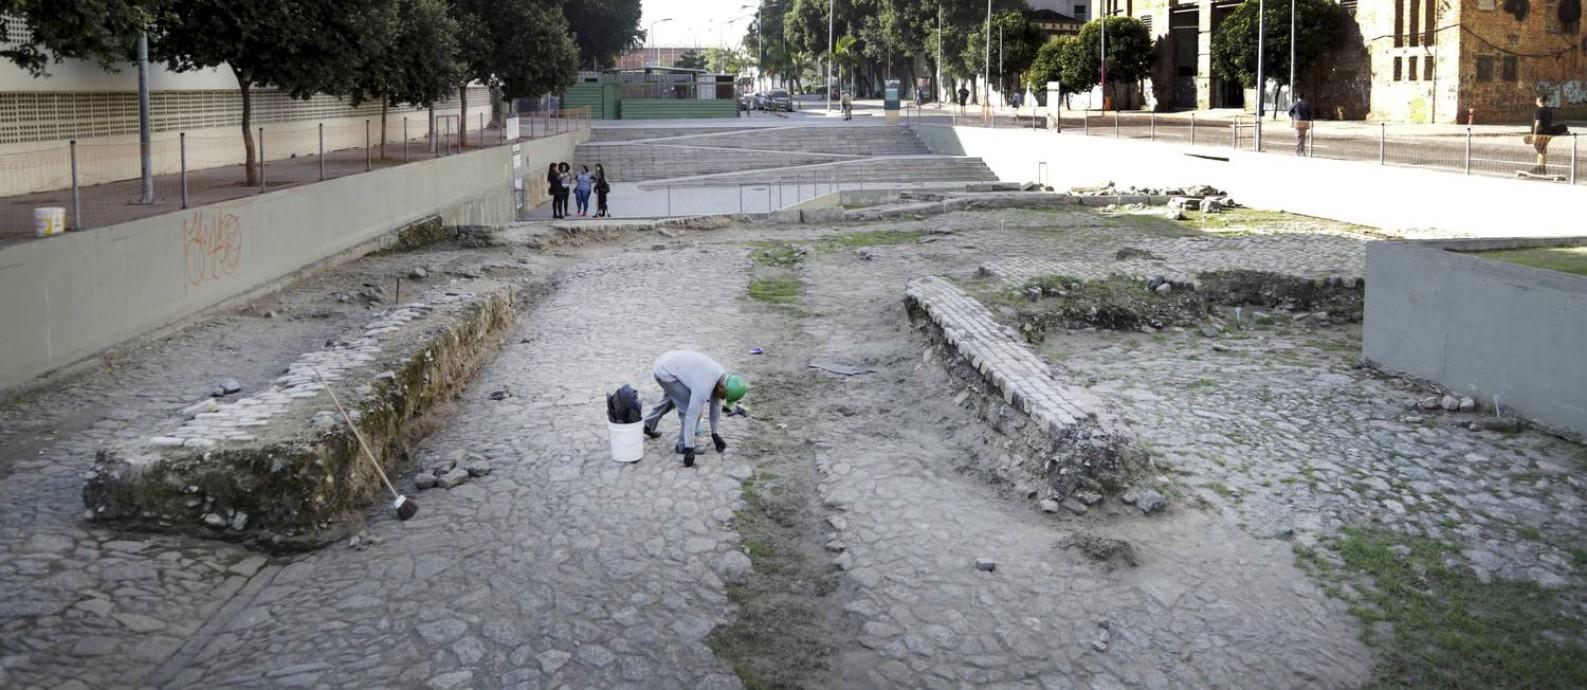 Apesar de título da Unesco, Cais do Valongo está abandonada pelo poder público Foto: Marcos Ramos / Agência O Globo